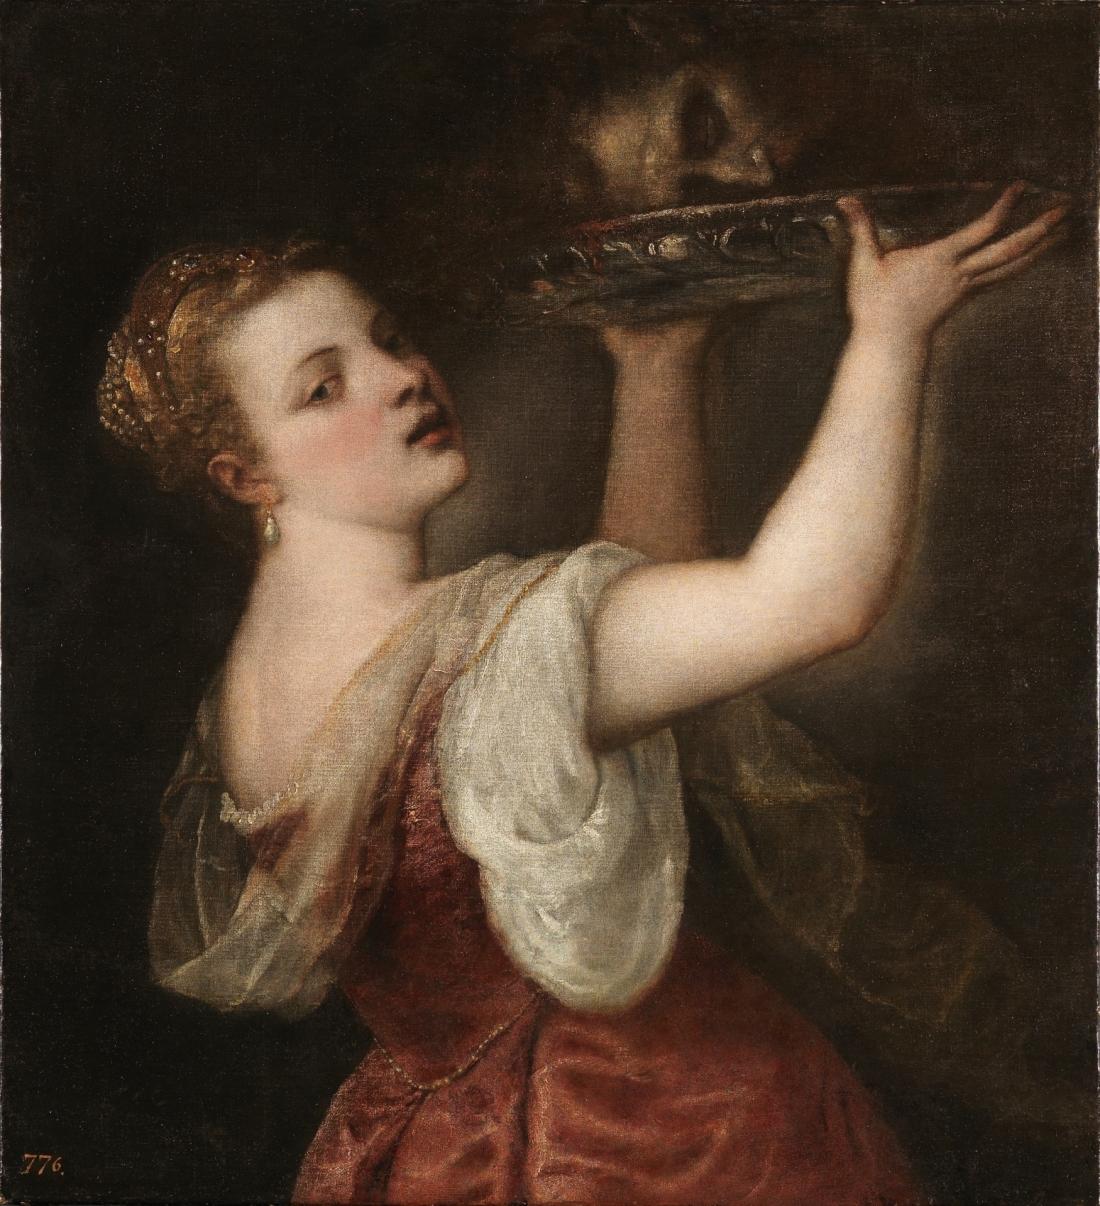 Salome, Titian, 1550